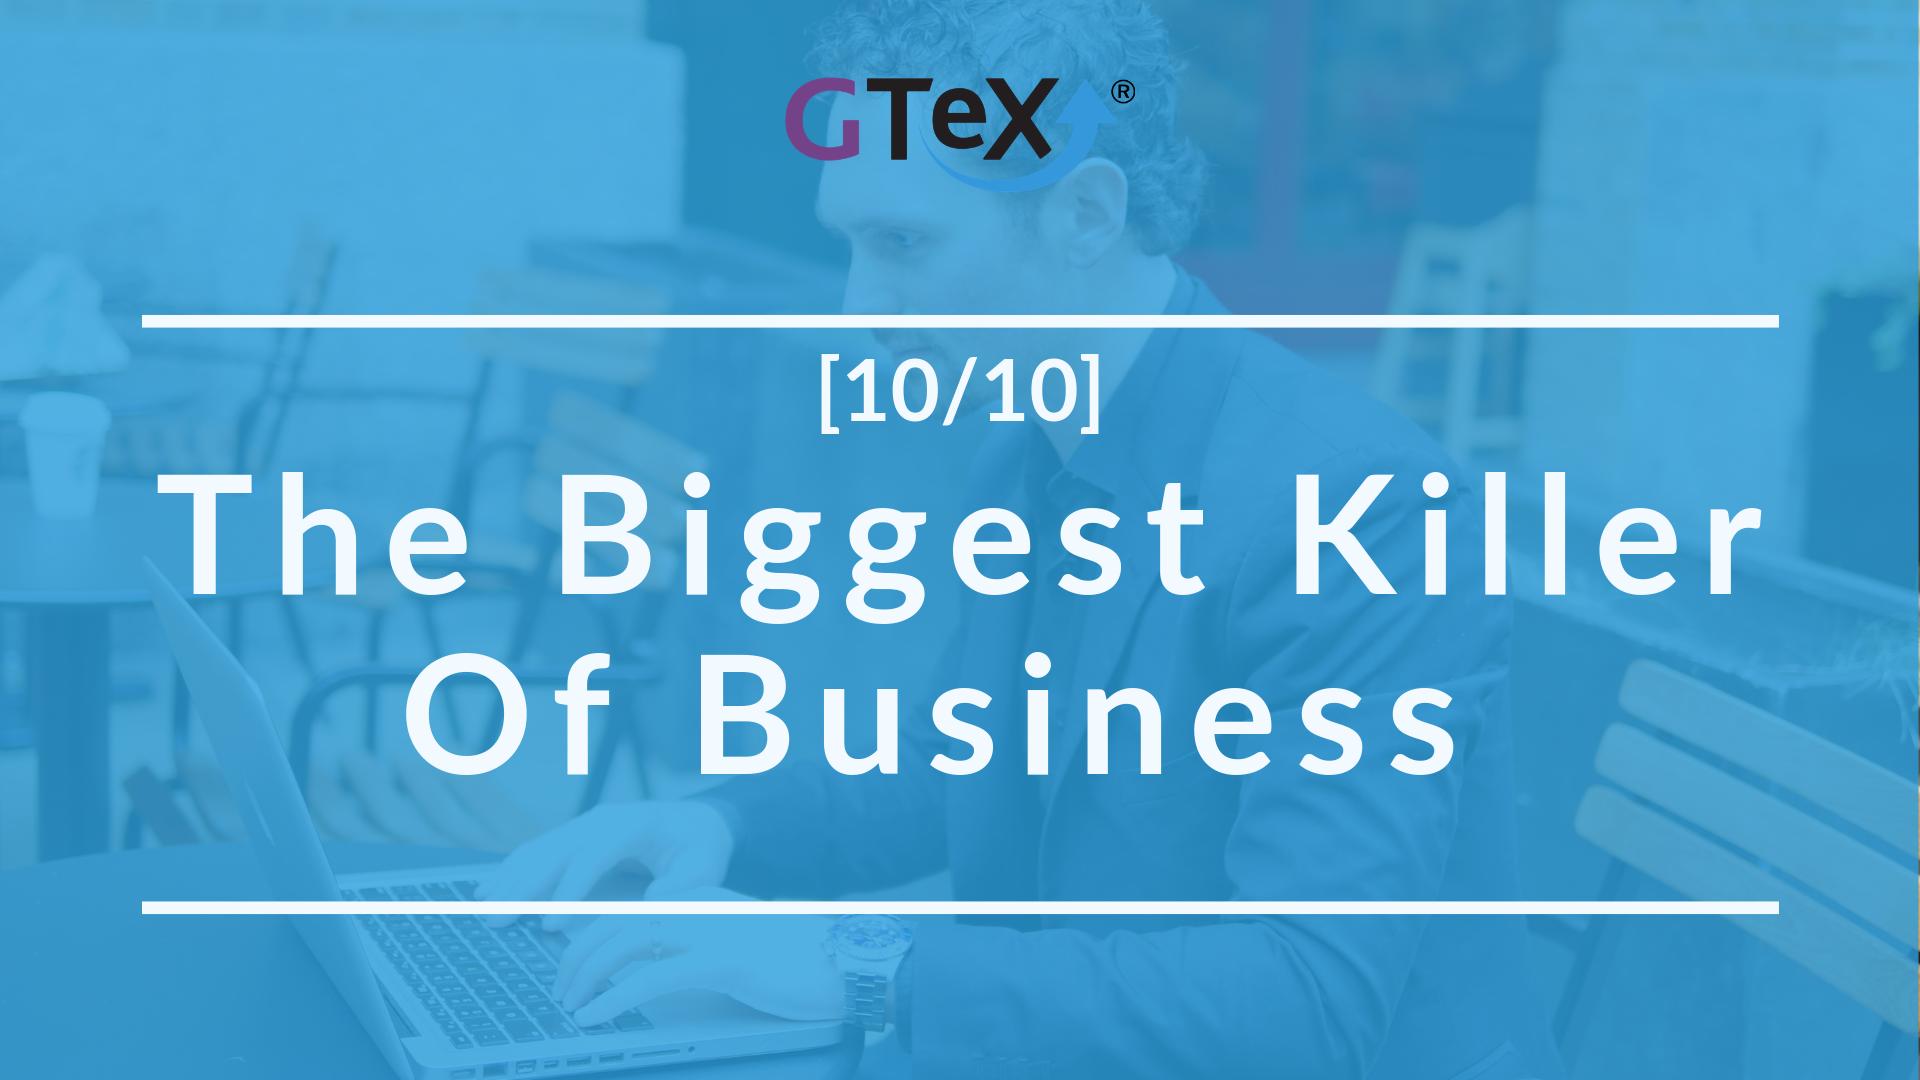 [10/10] The biggest killer of businesses